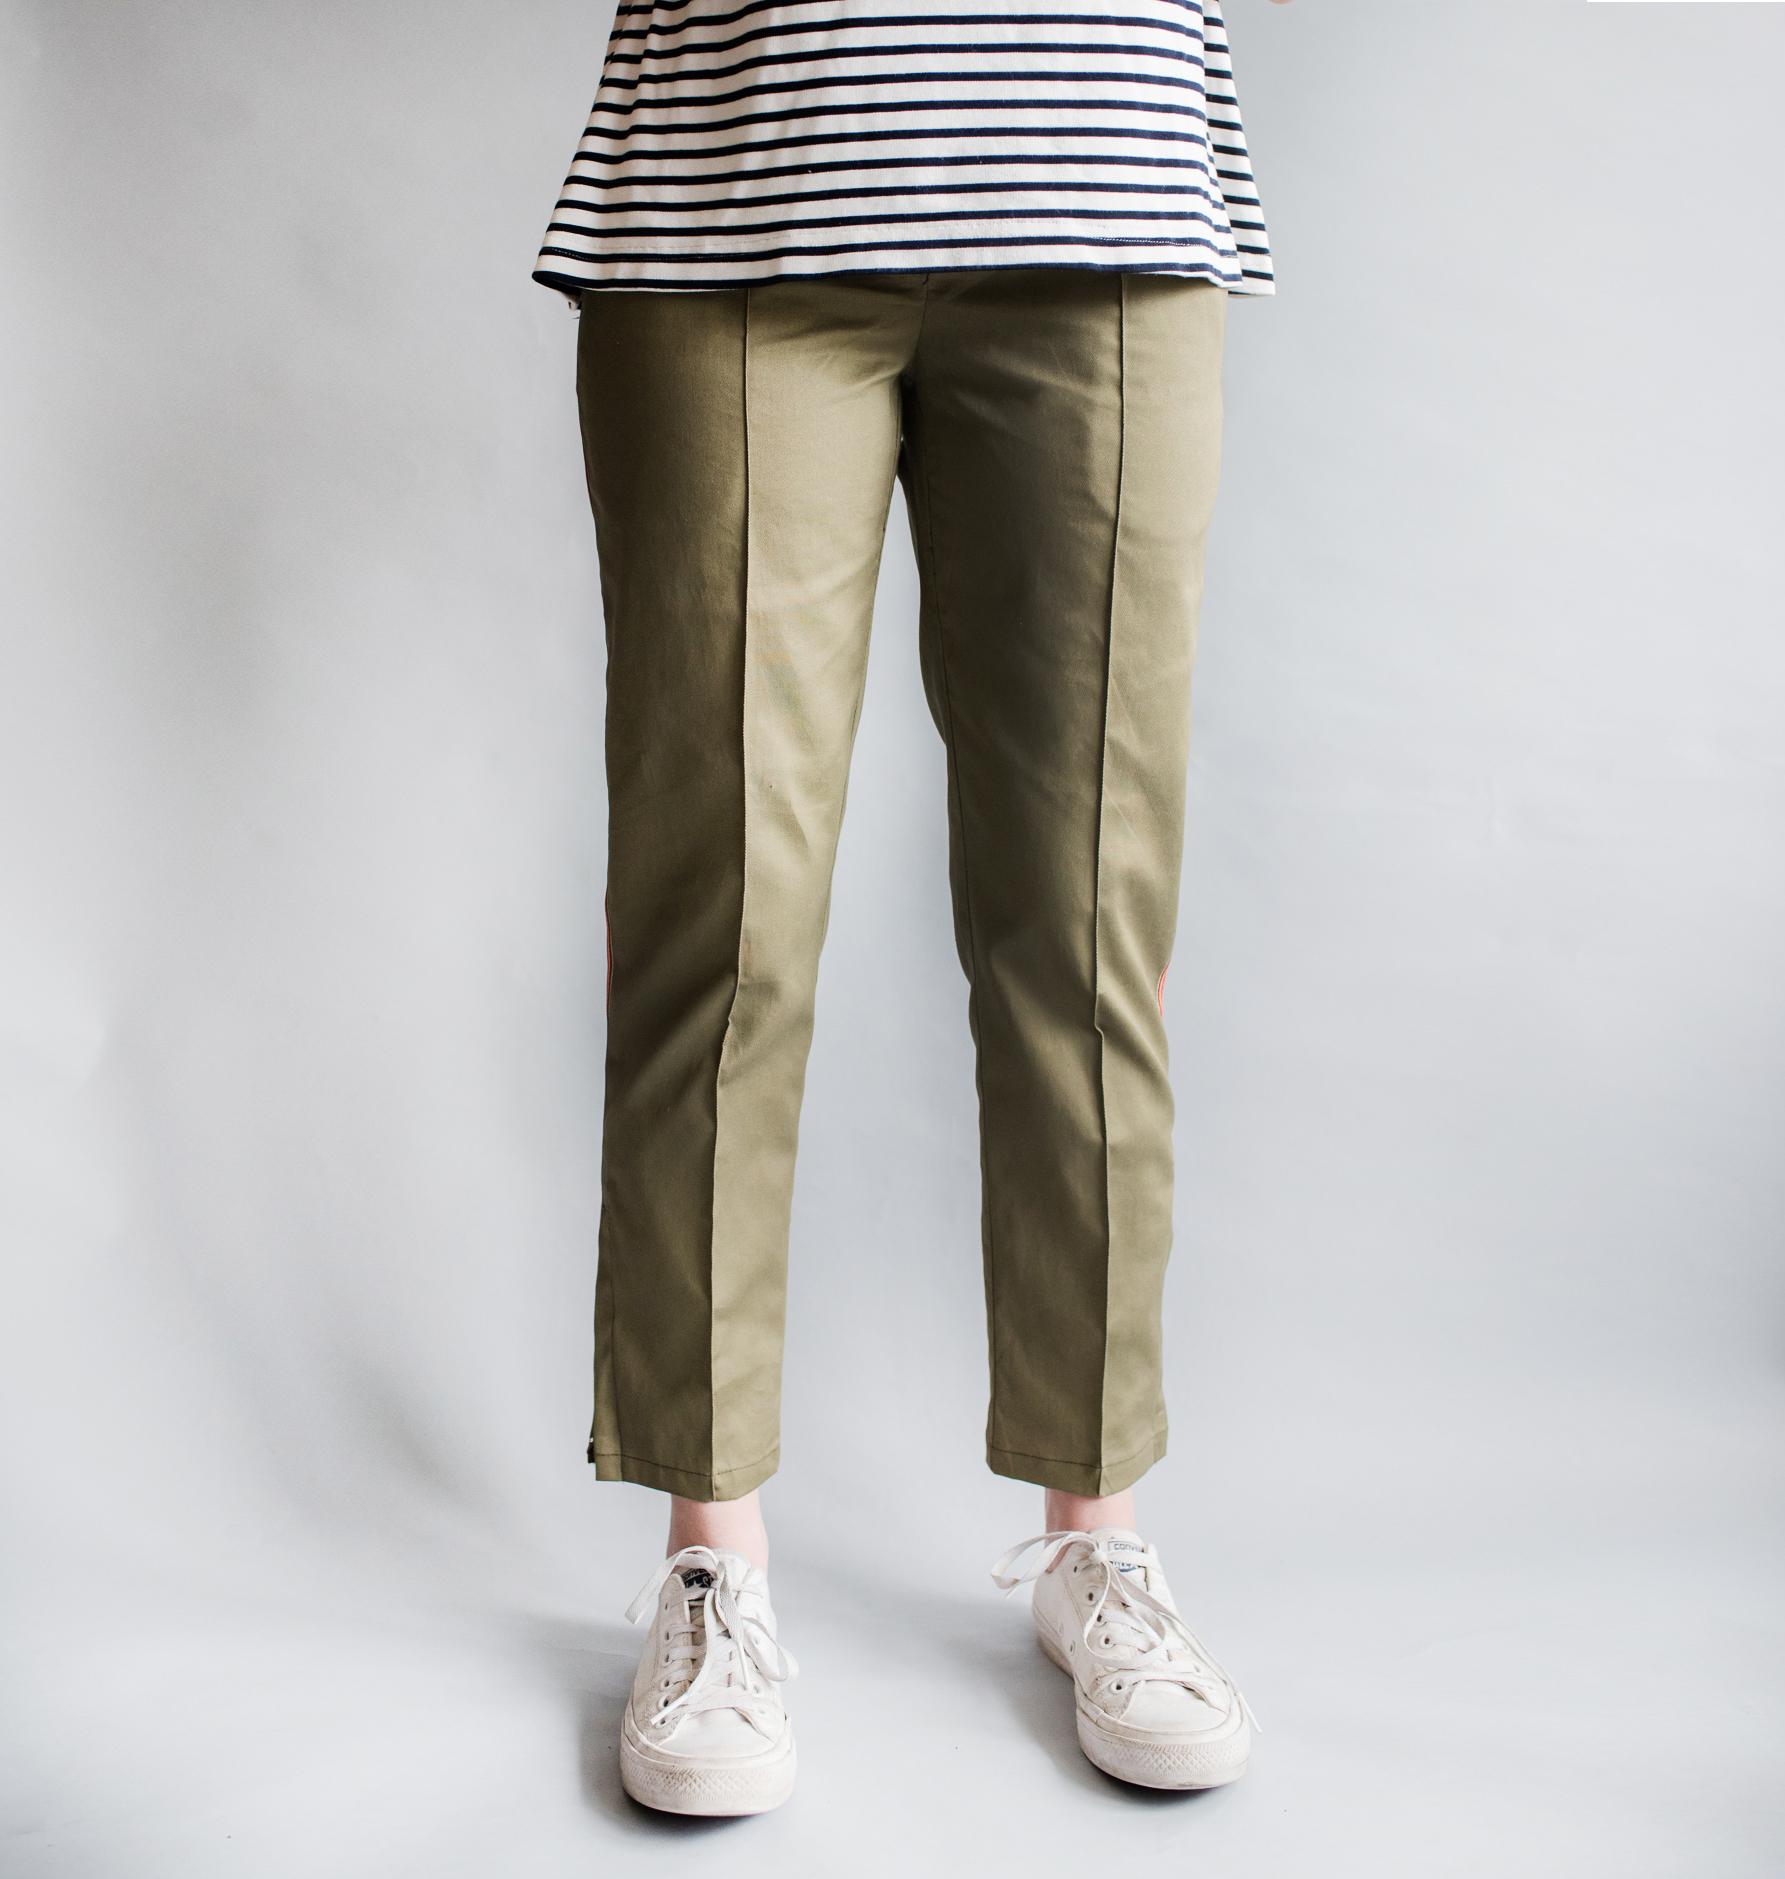 robinson-pdf-sewing-trouser30.jpg